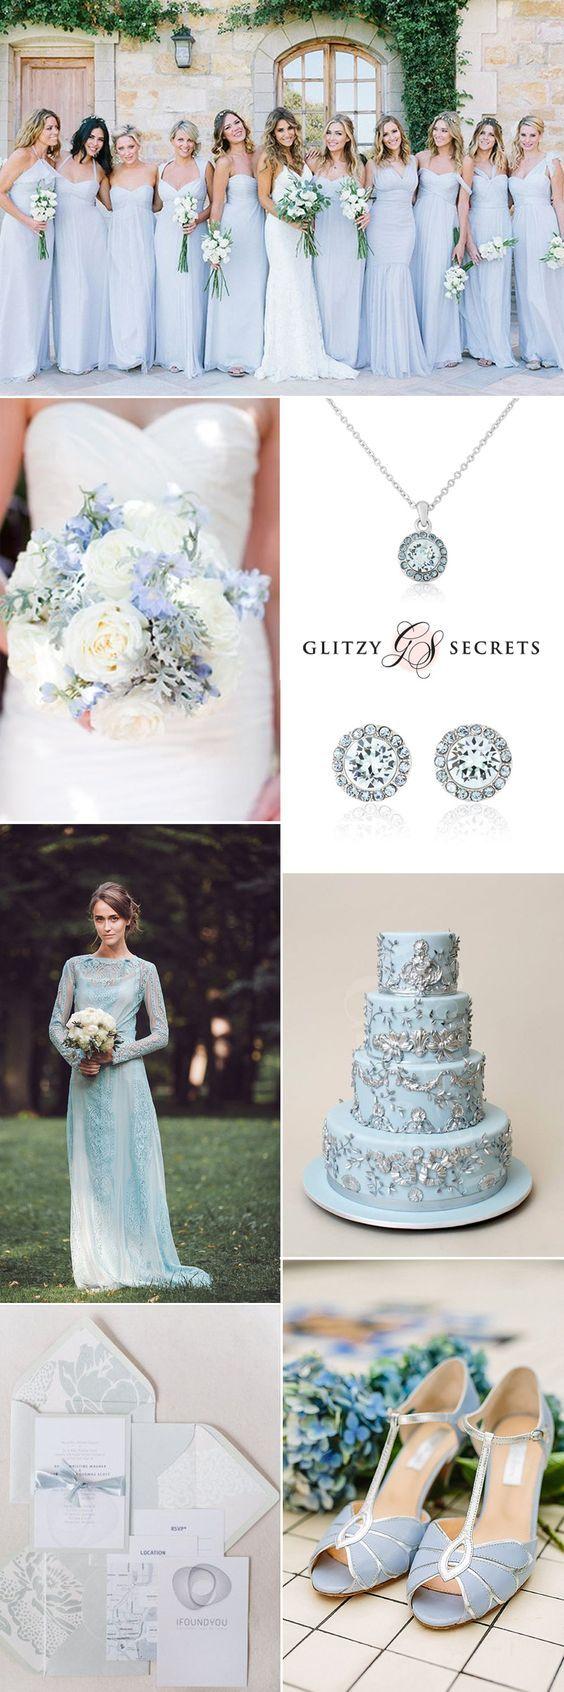 Something Blue & Silver Wedding Ideas   Elegant wedding themes, Blue ...